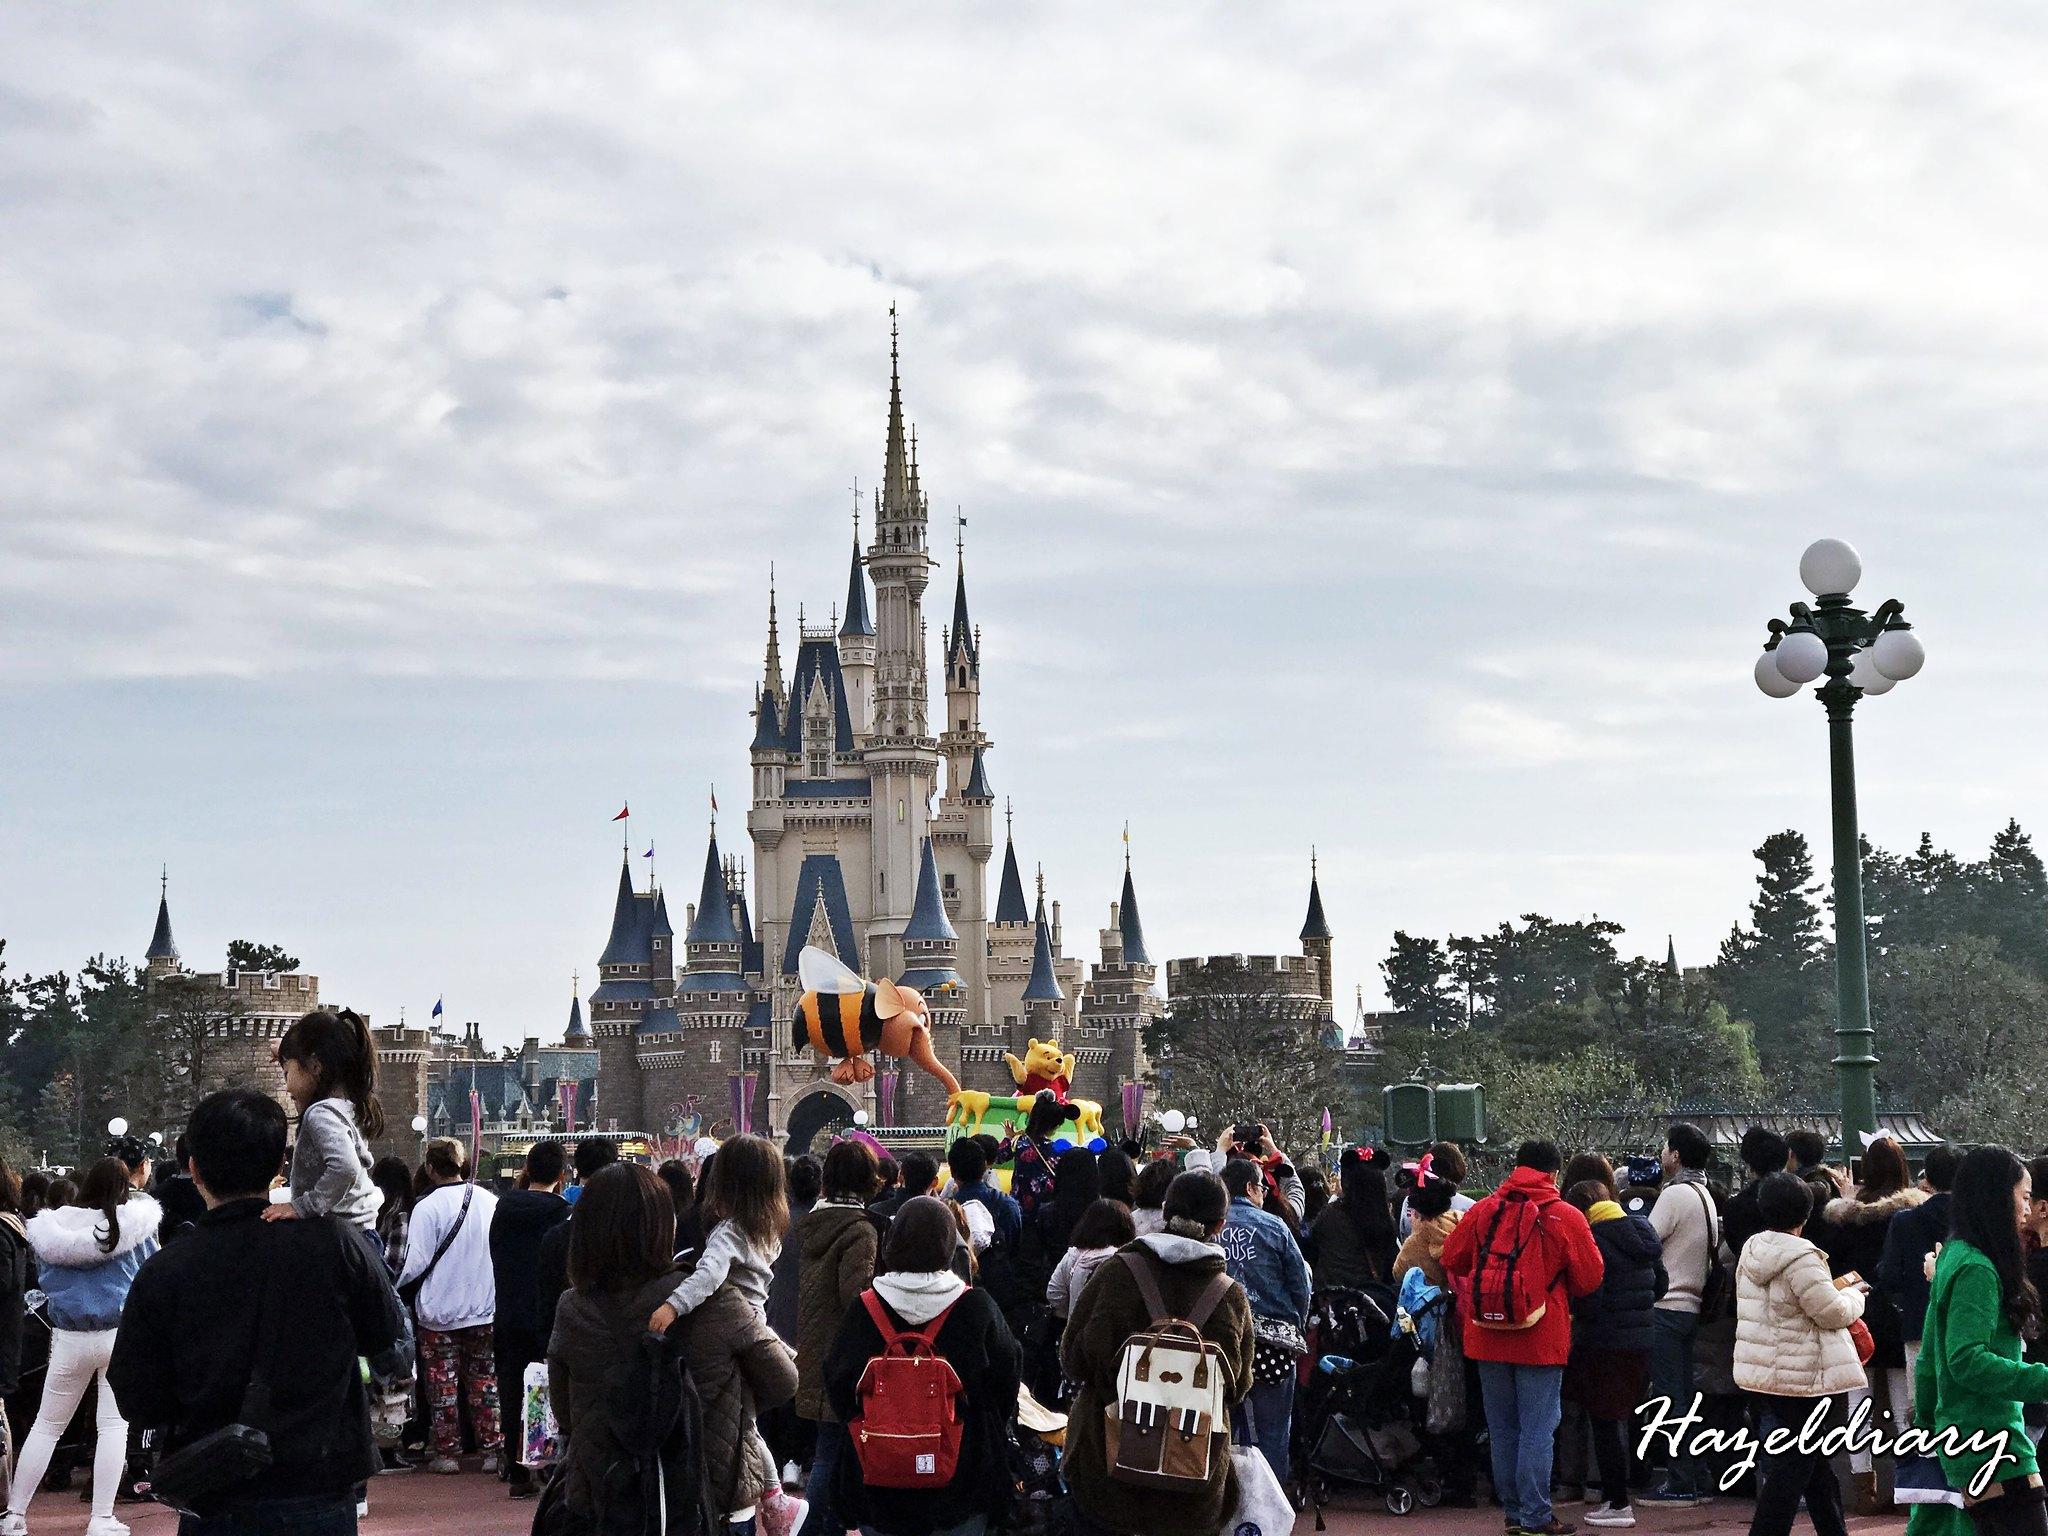 [JAPAN TRAVELS] 1 Day Trip to Tokyo Disneyland